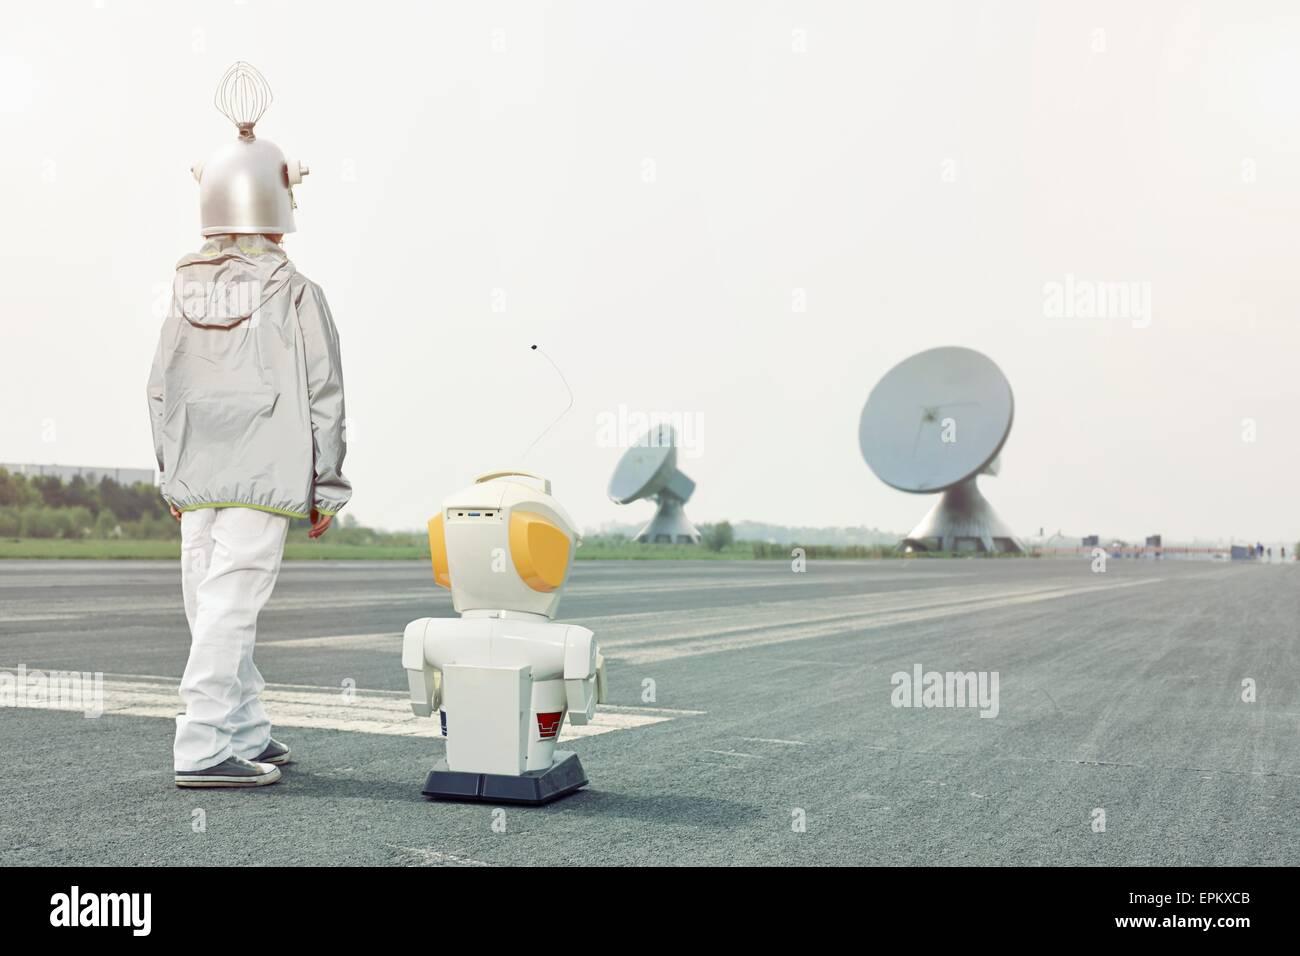 Junge verkleidet als Raumfahrer mit Roboter Stockbild